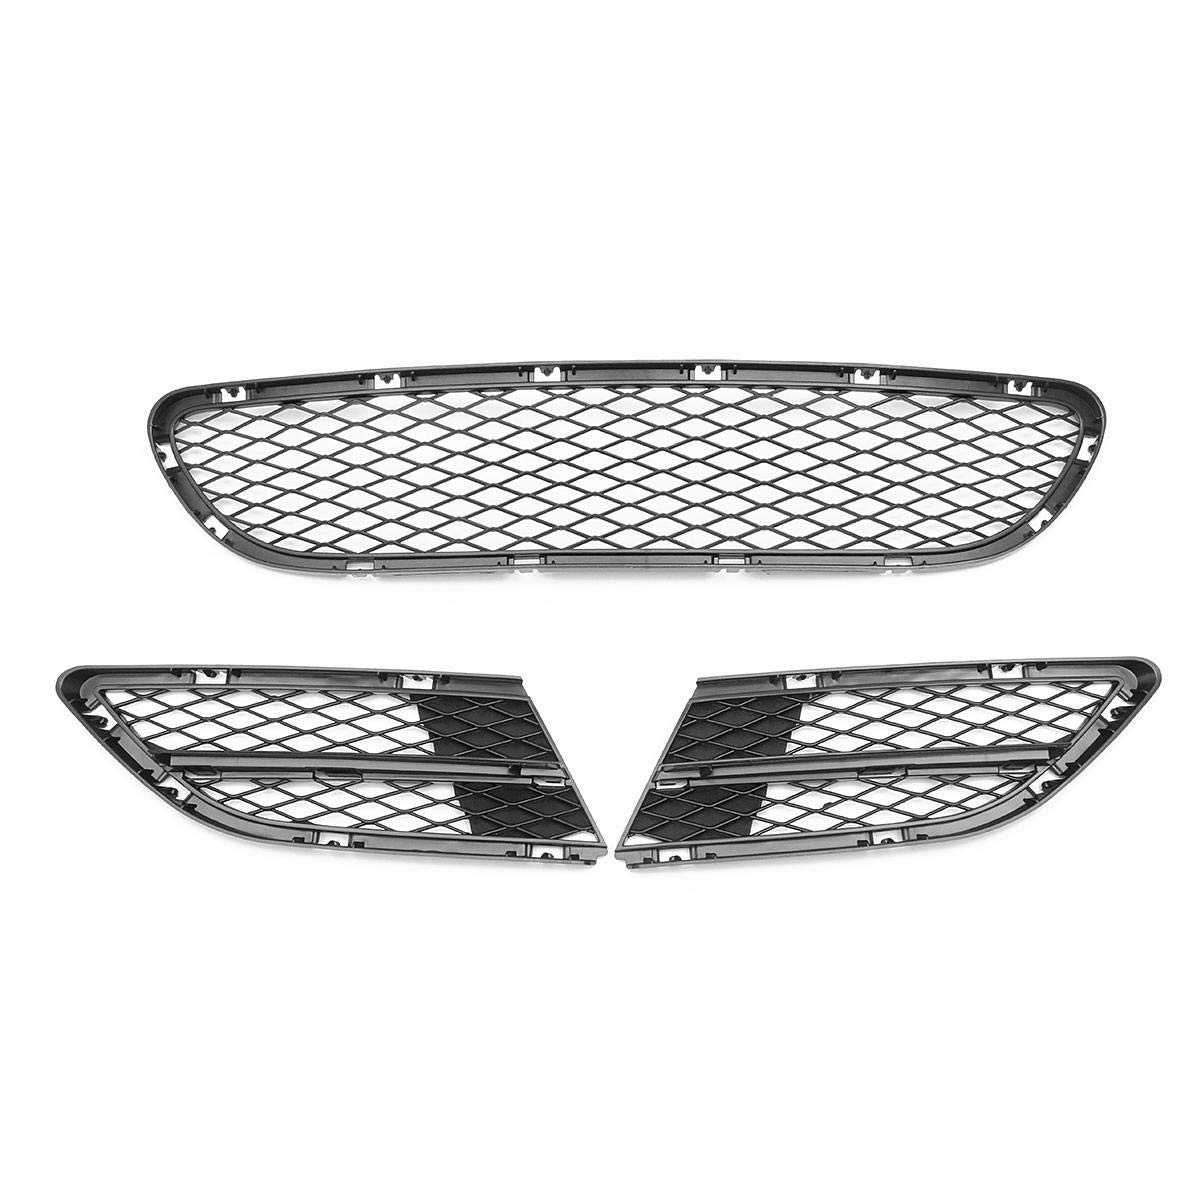 Rejilla de rejilla delantera inferior para rejilla de ventilaci/ón de parachoques delantero para BMW Serie 3 E90 E91 325i 328i 335i COD